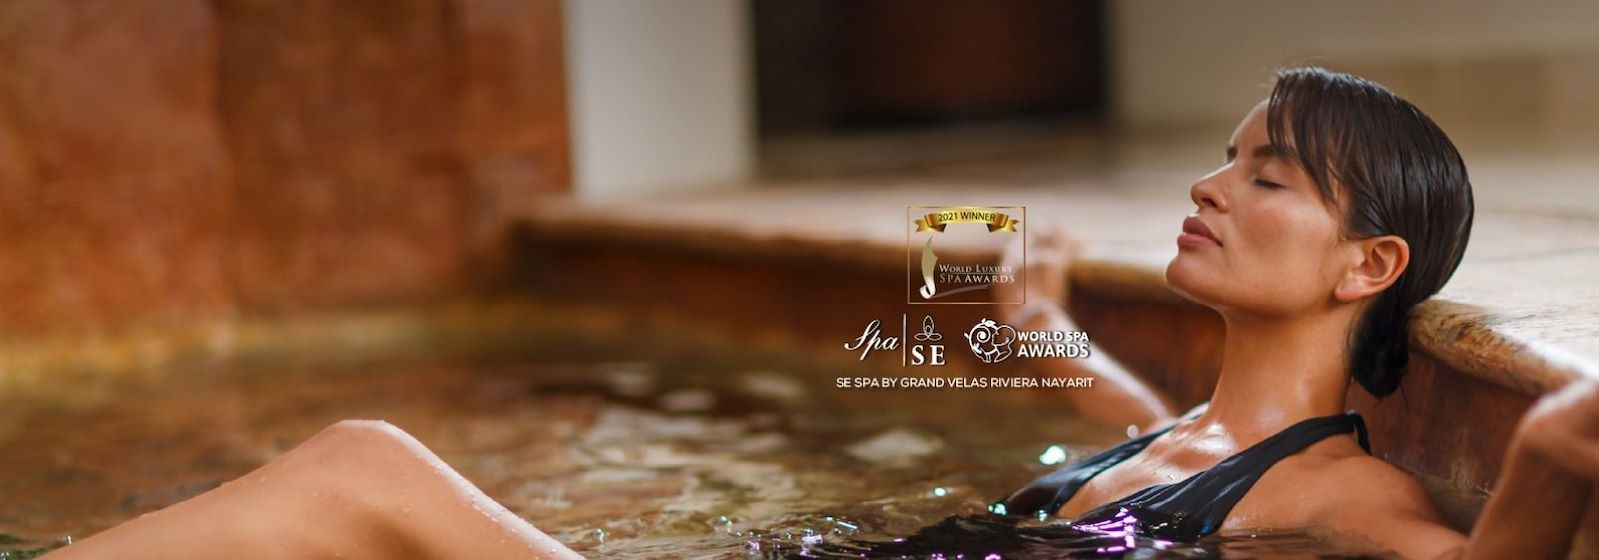 Grand Velas Riviera Nayarit offering Weddings Facilities